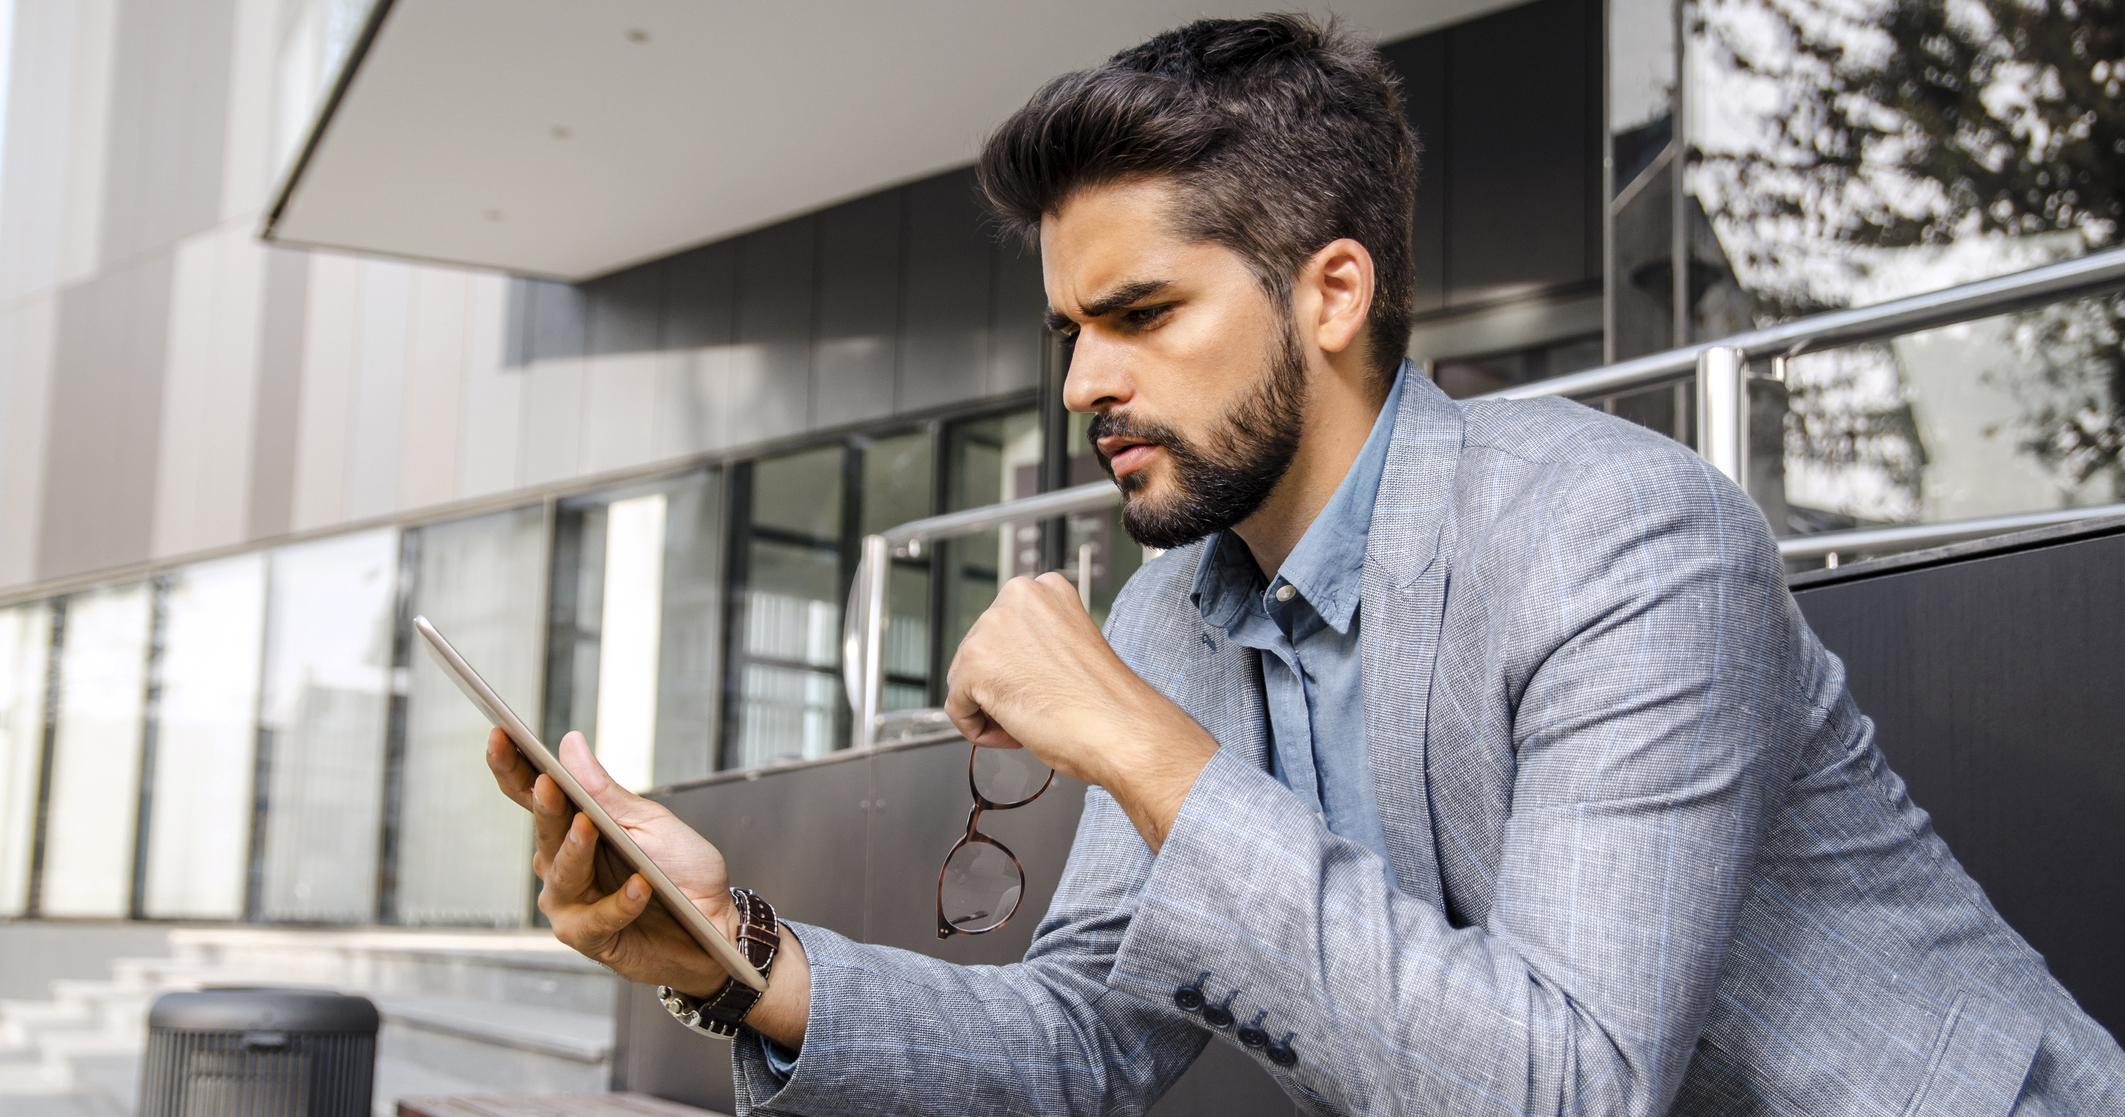 Man using tablet in office: CARROTBAT